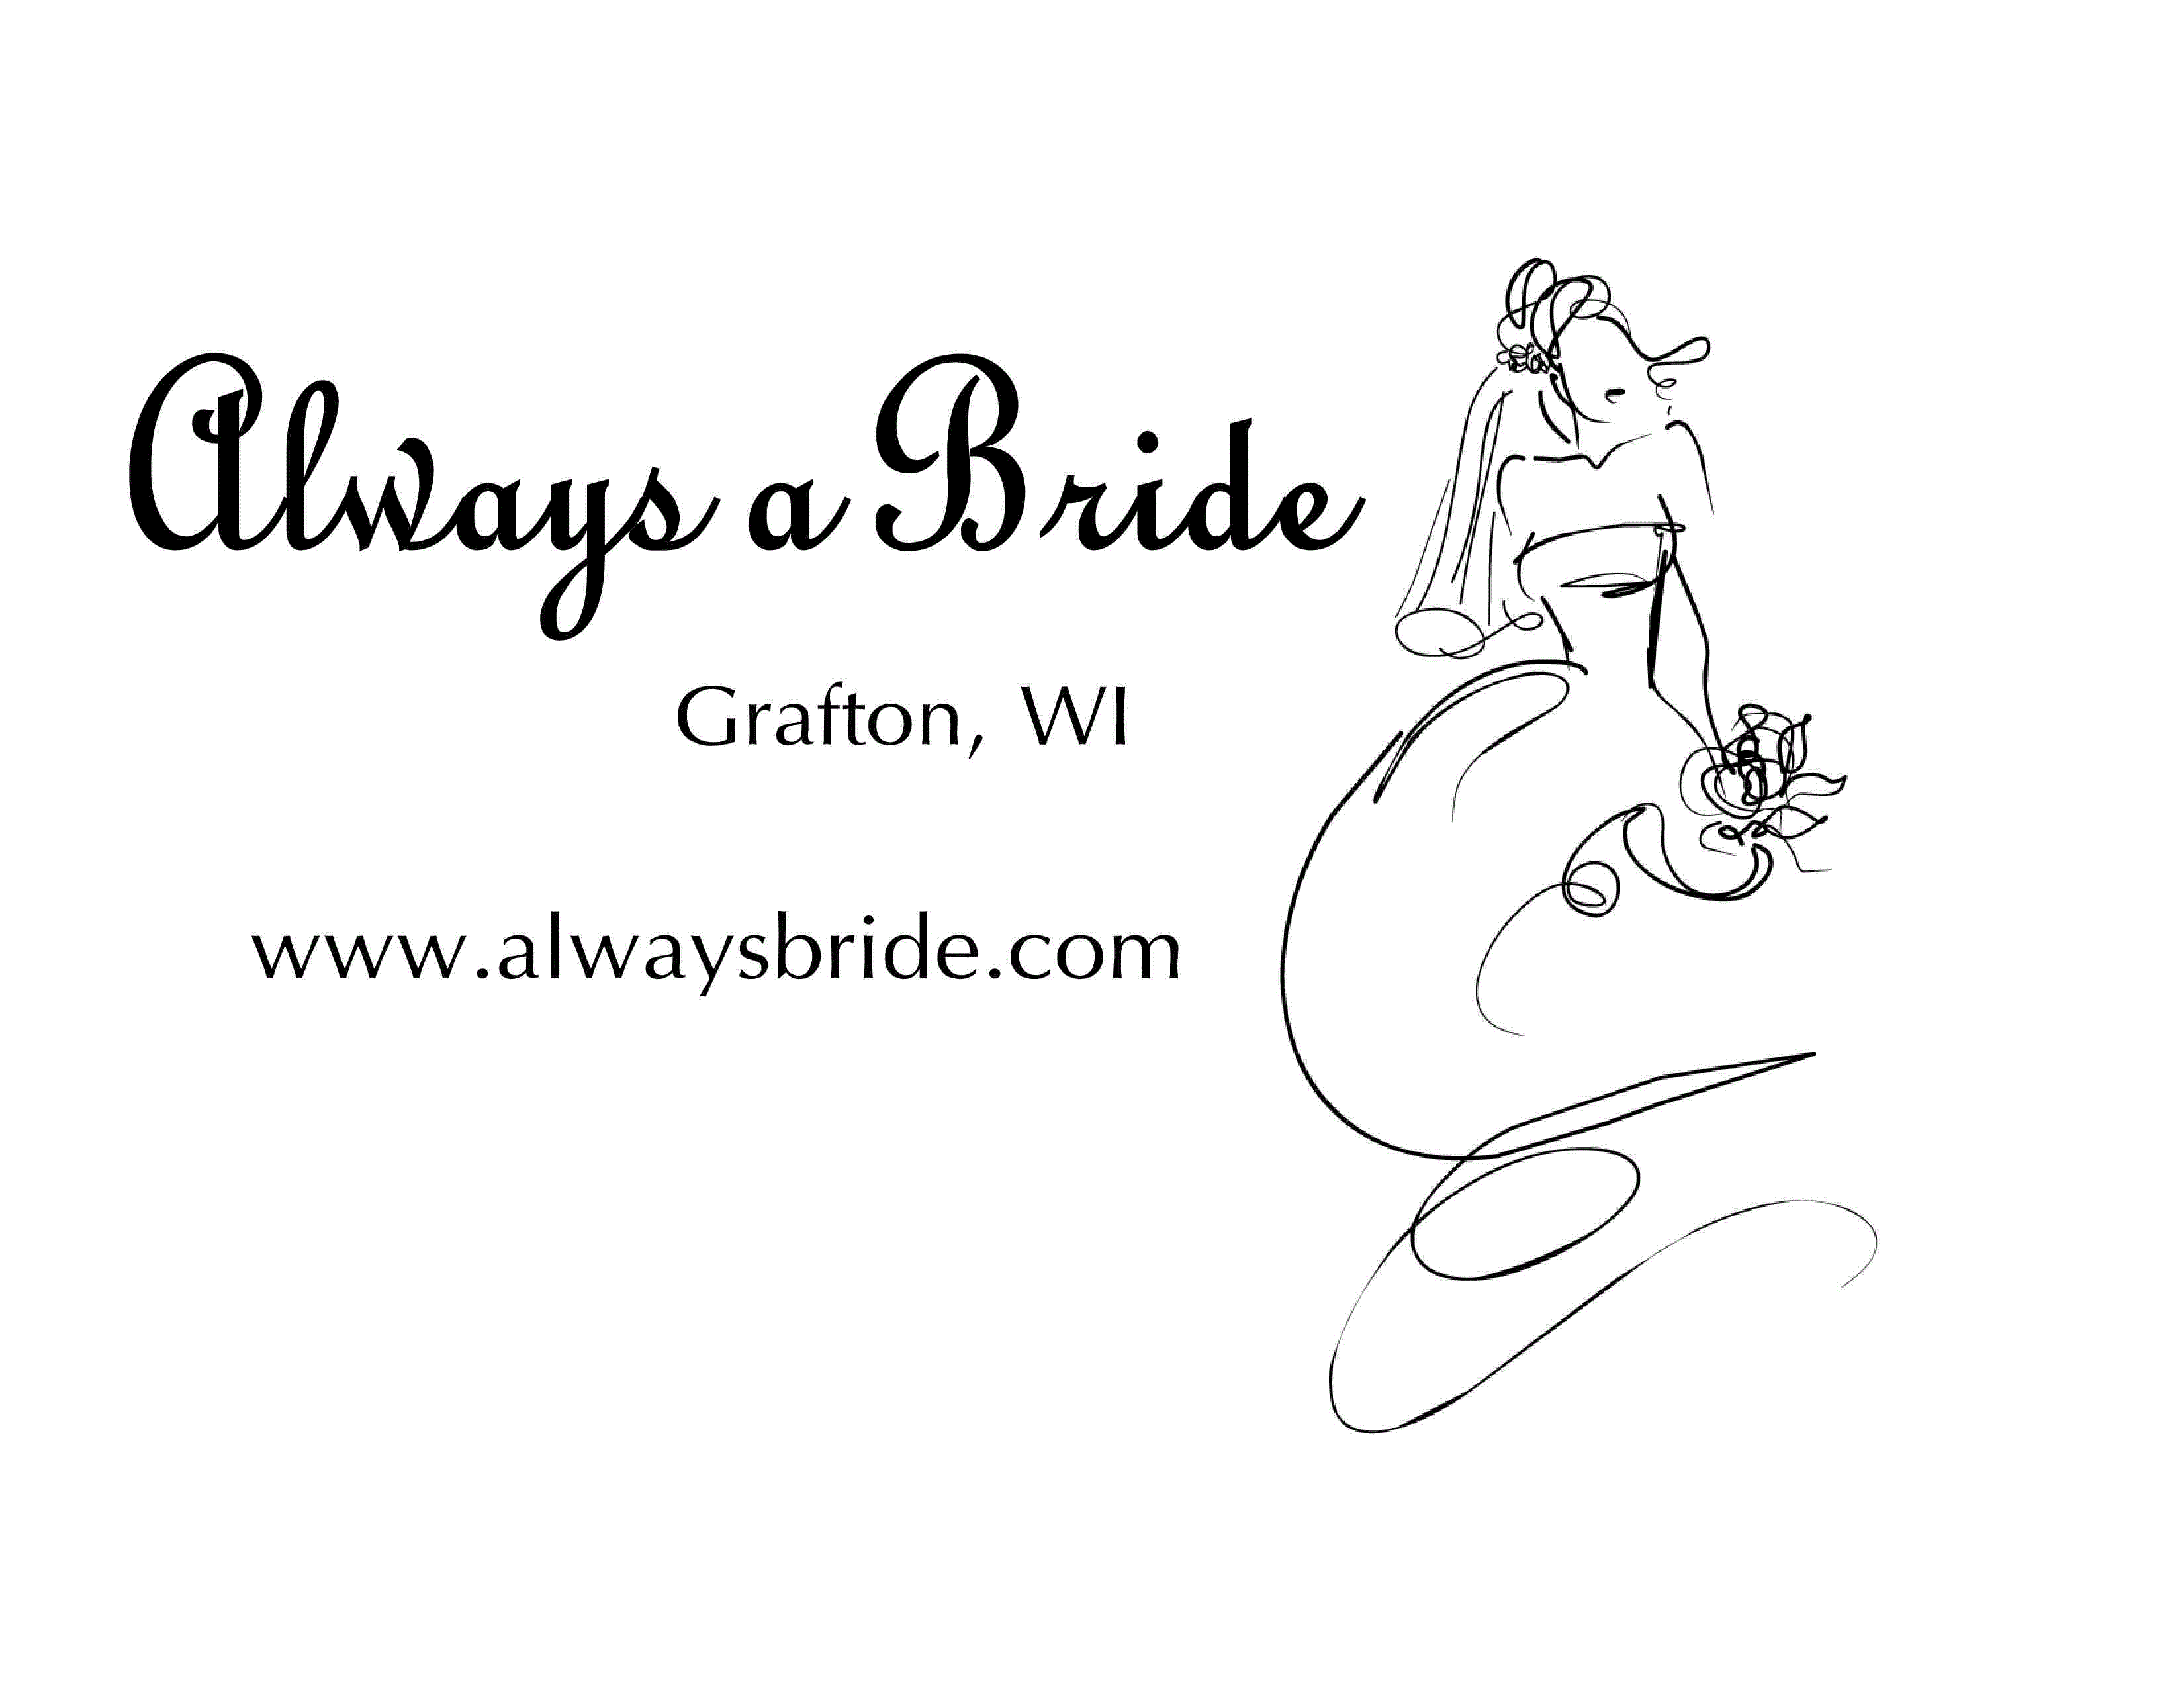 Bridal Shop in WI Grafton 53024 Always a Bride Wedding Consignment 1540 Wisconsin Ave  (262)573-8801